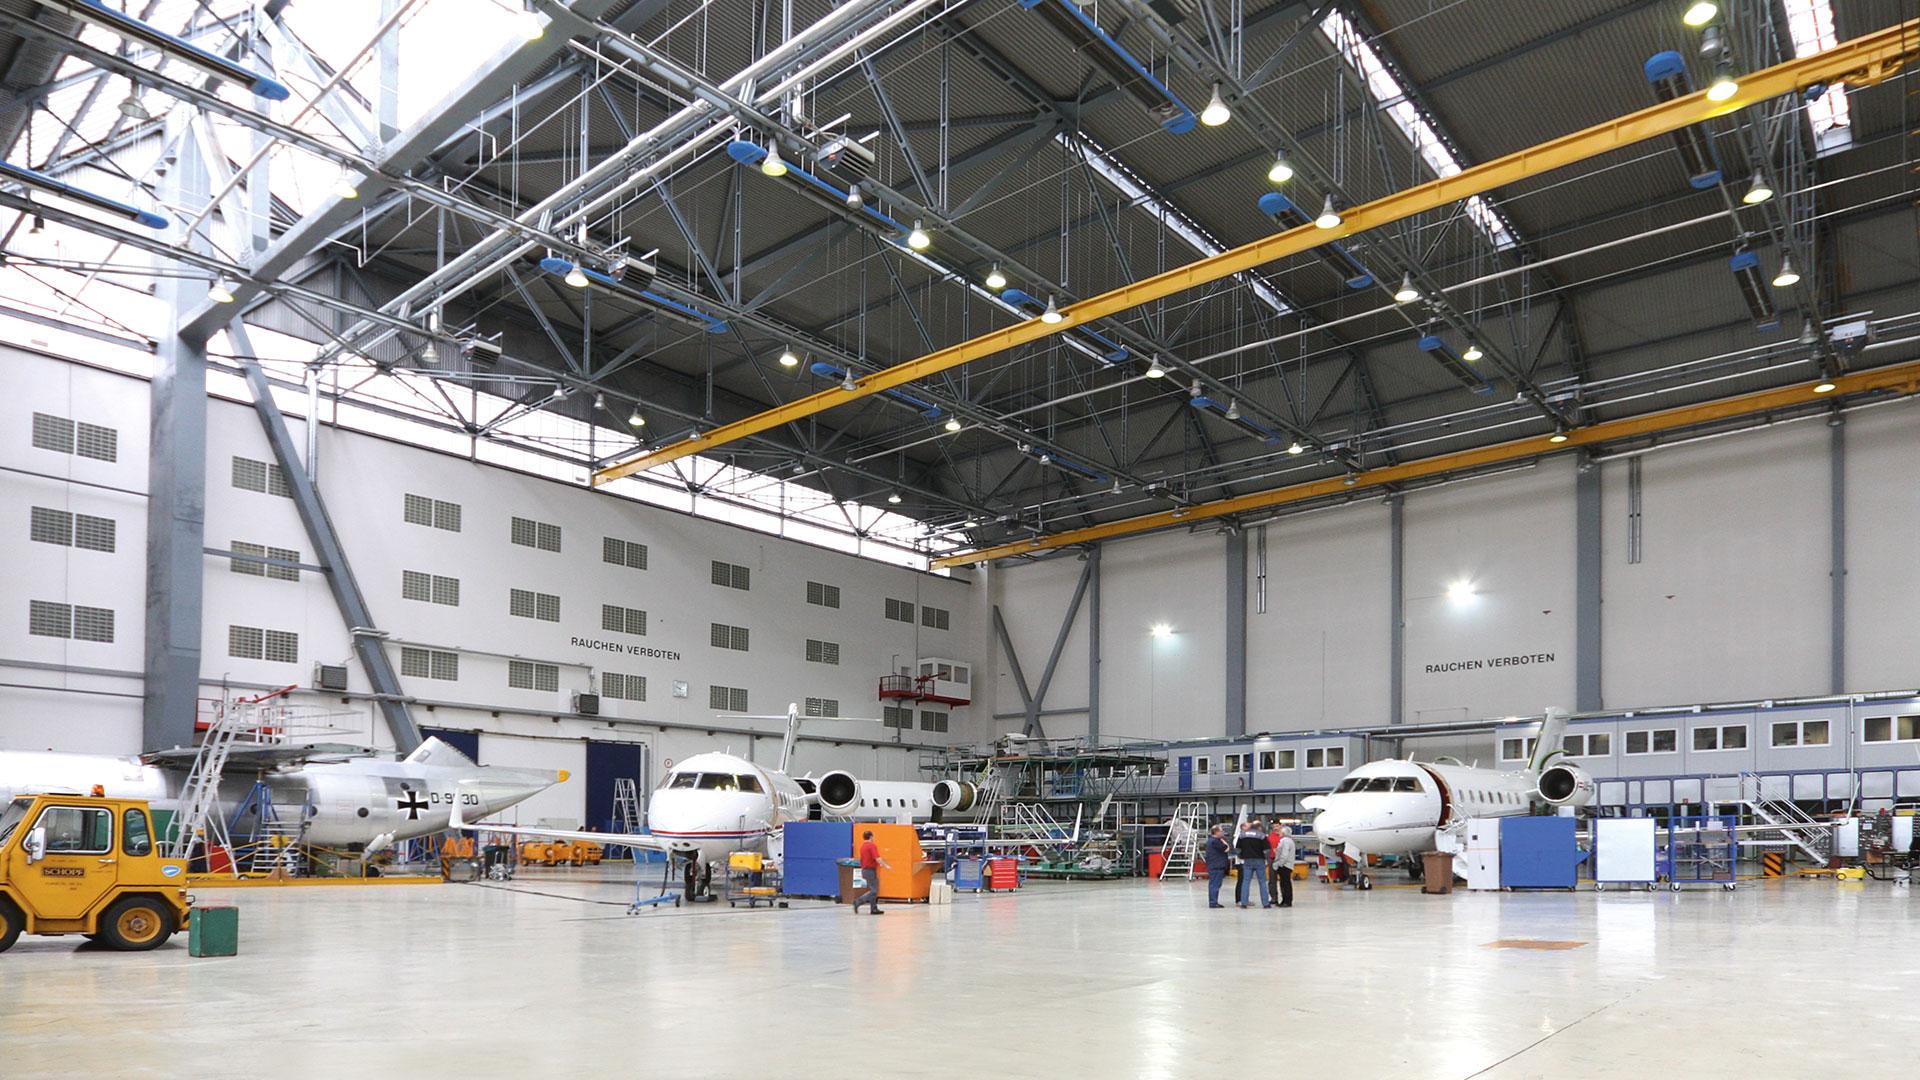 Hangar mit Flugzeugen, Gabelstapler, Personal.